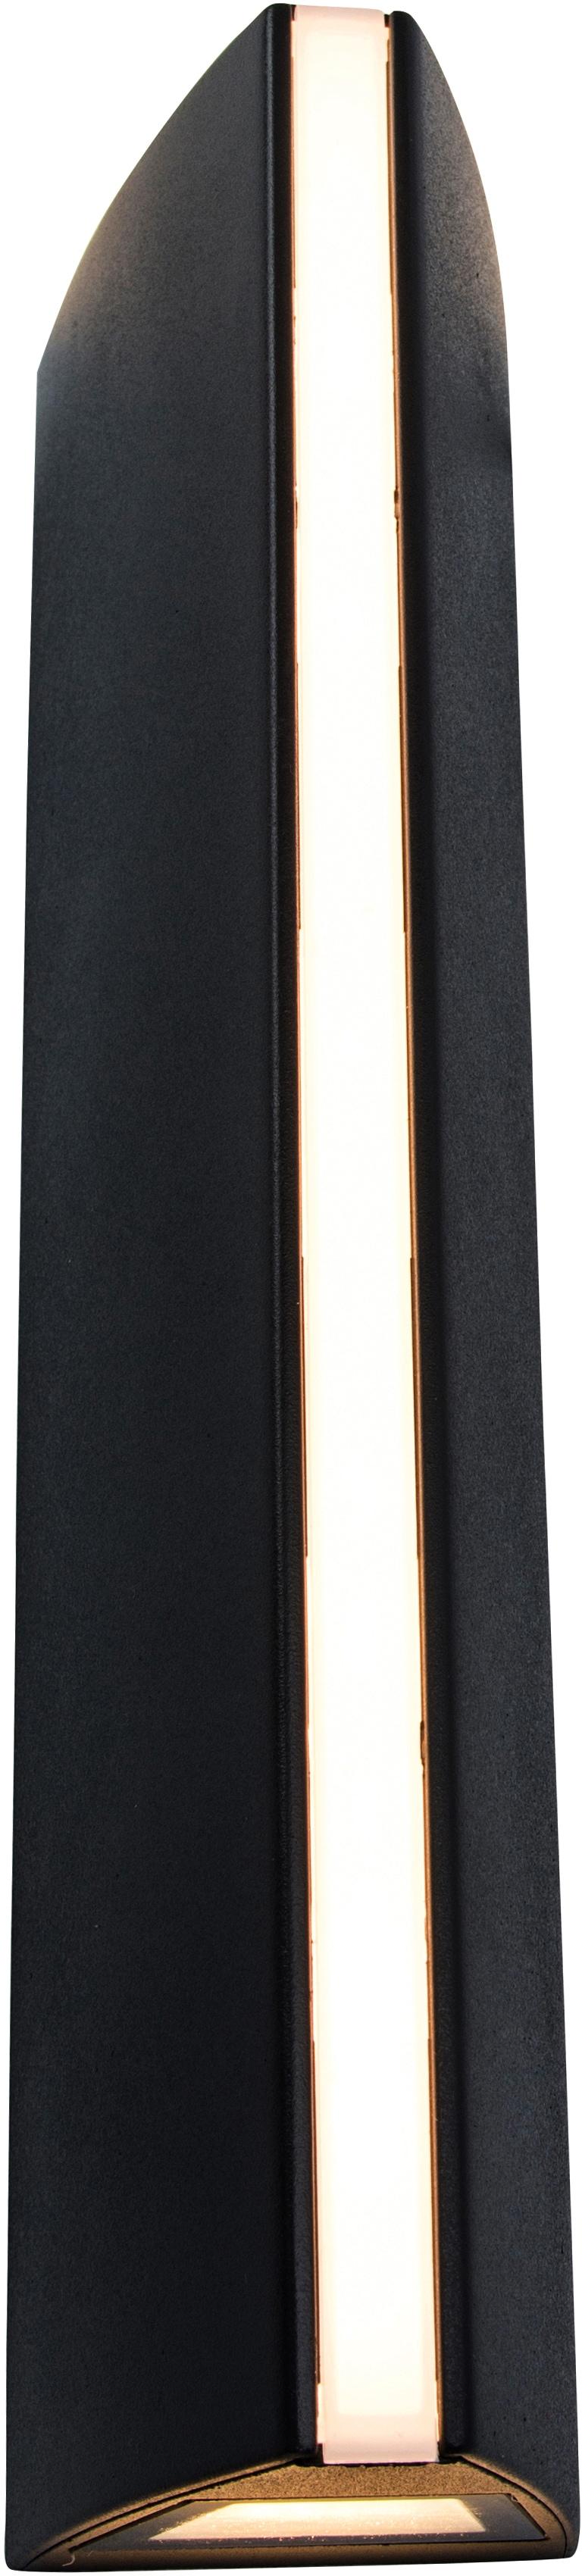 LUTEC LED Außen-Wandleuchte LEO 5192701330, LED-Modul, 1 St., Warmweiß